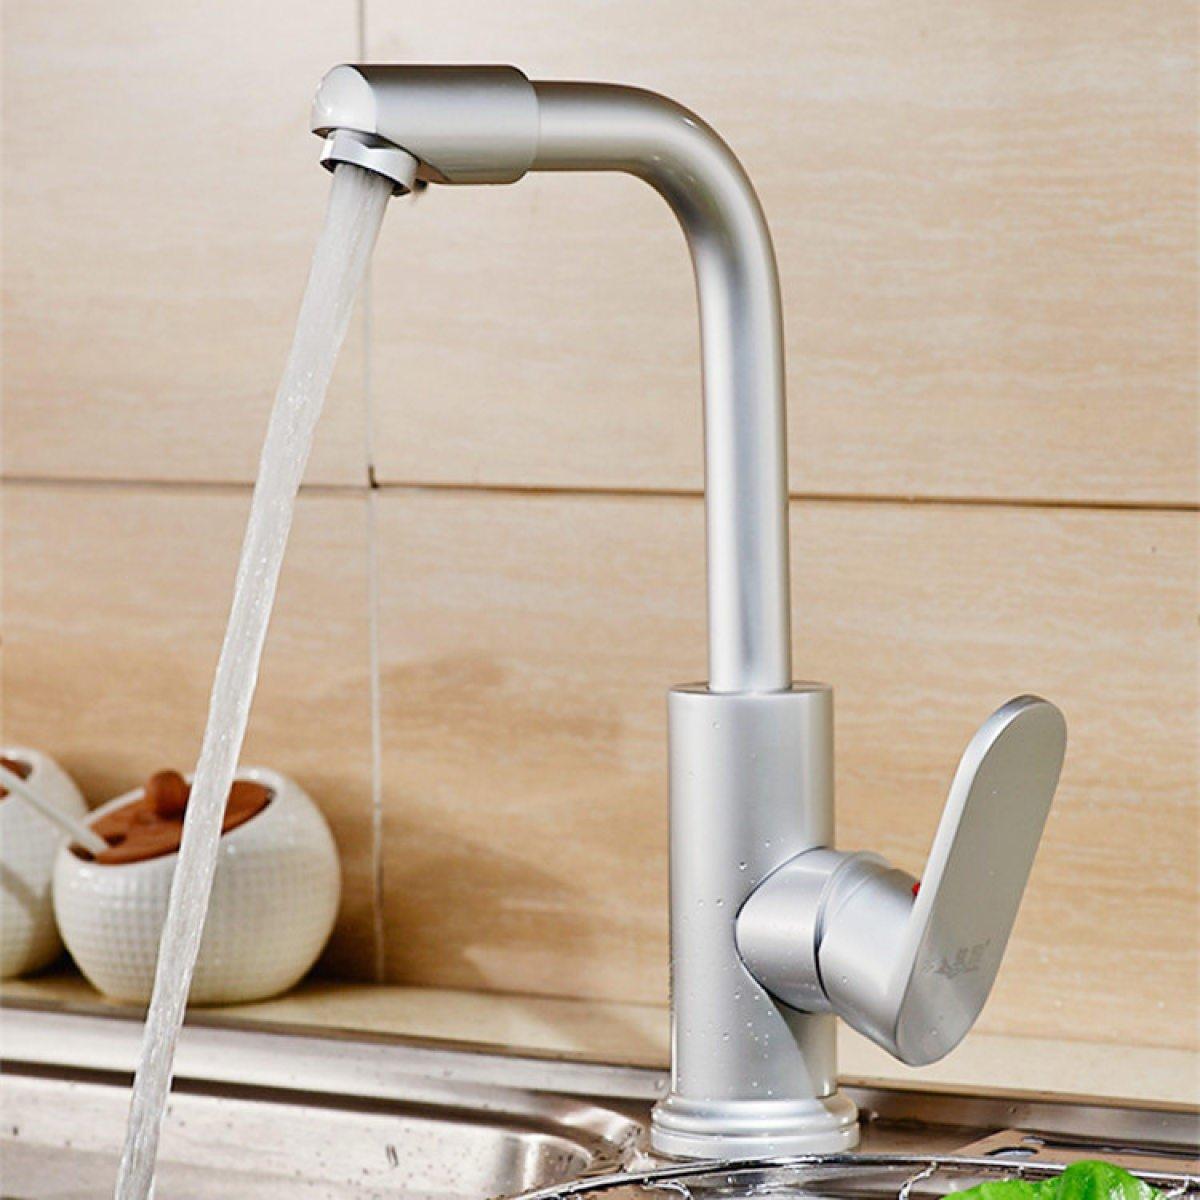 LDONGSH Space Aluminum Basin Table Basin Sanitary Ware Bathroom Wash Single Hole Hot And Cold Mixed Water Faucet Tap